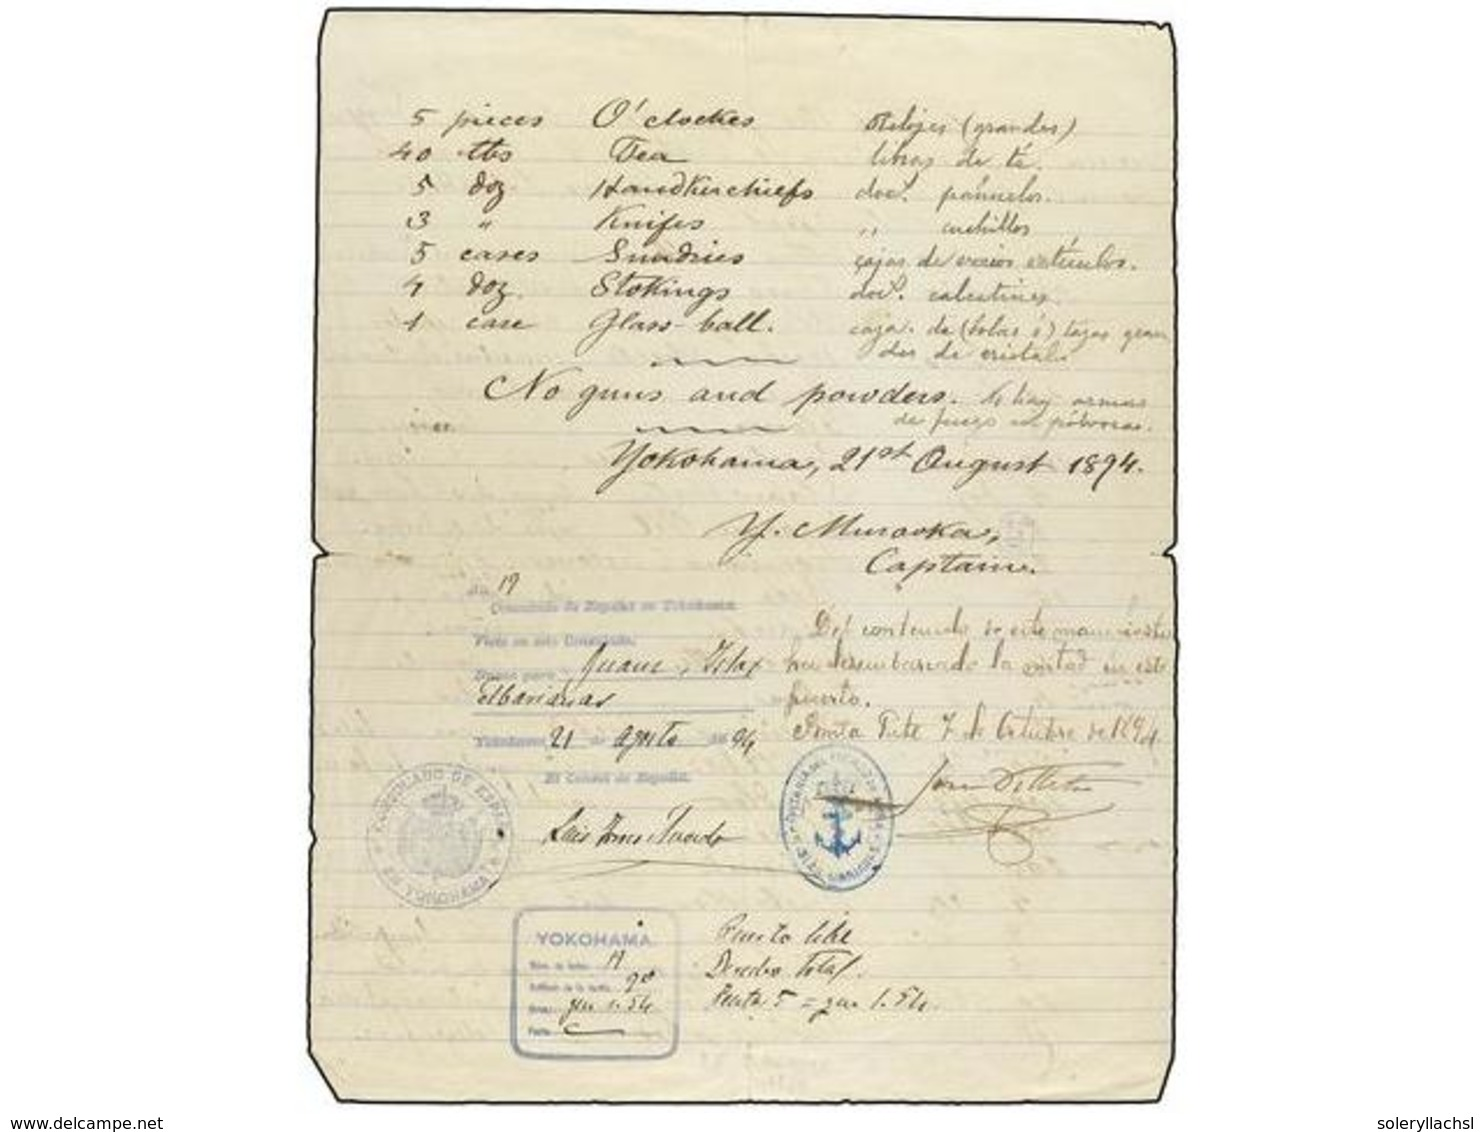 MARIANAS. 1894. MANIFIESTO DE CARGA Desde El Puerto De YOKOHAMA A SAN LUIS DE APRA (Guam). Marca Del Consulado Español E - Non Classés